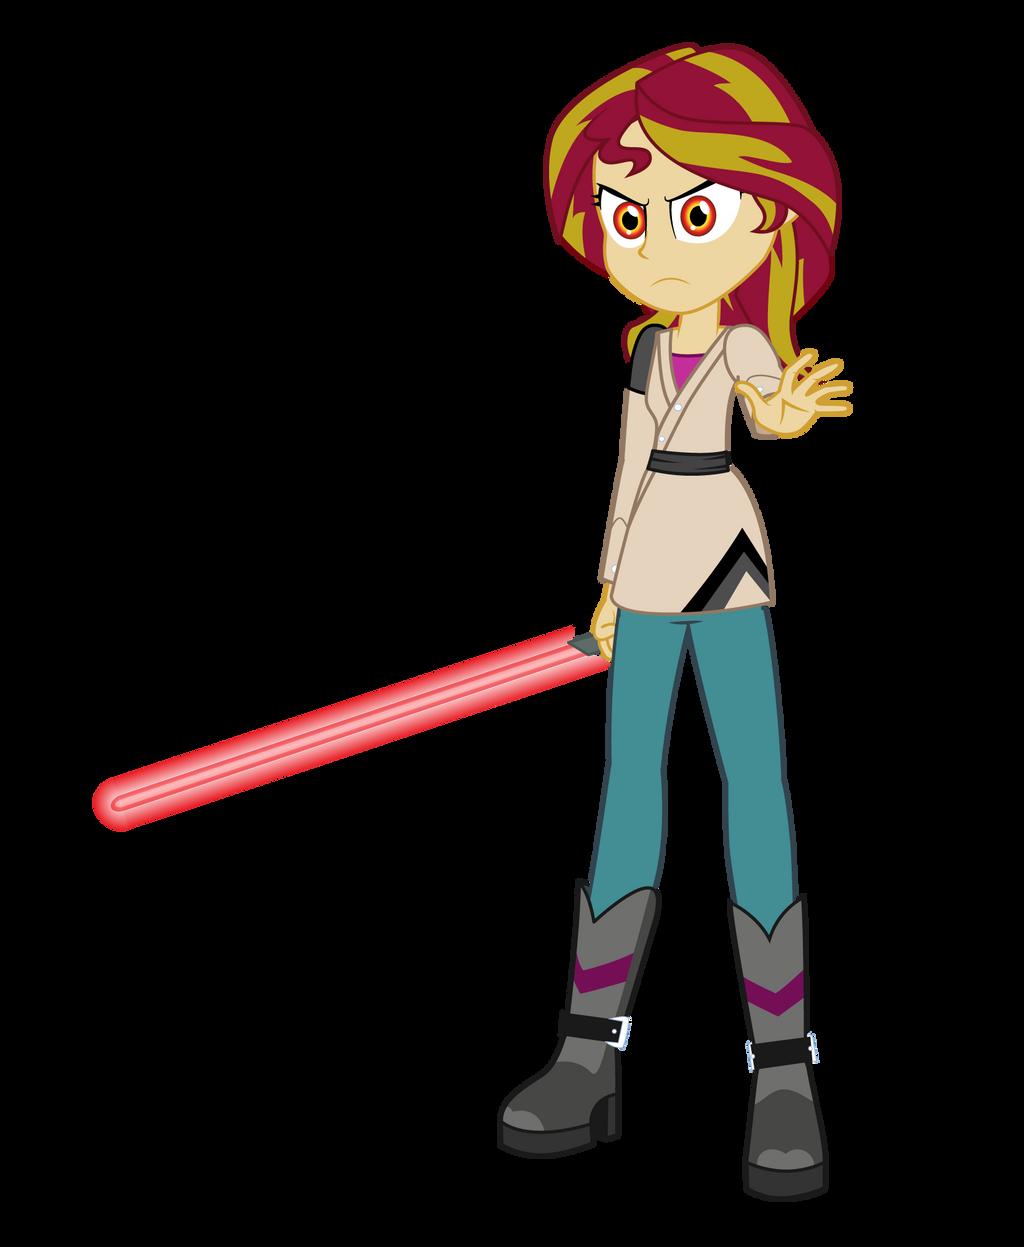 Fallen Jedi by Amante56